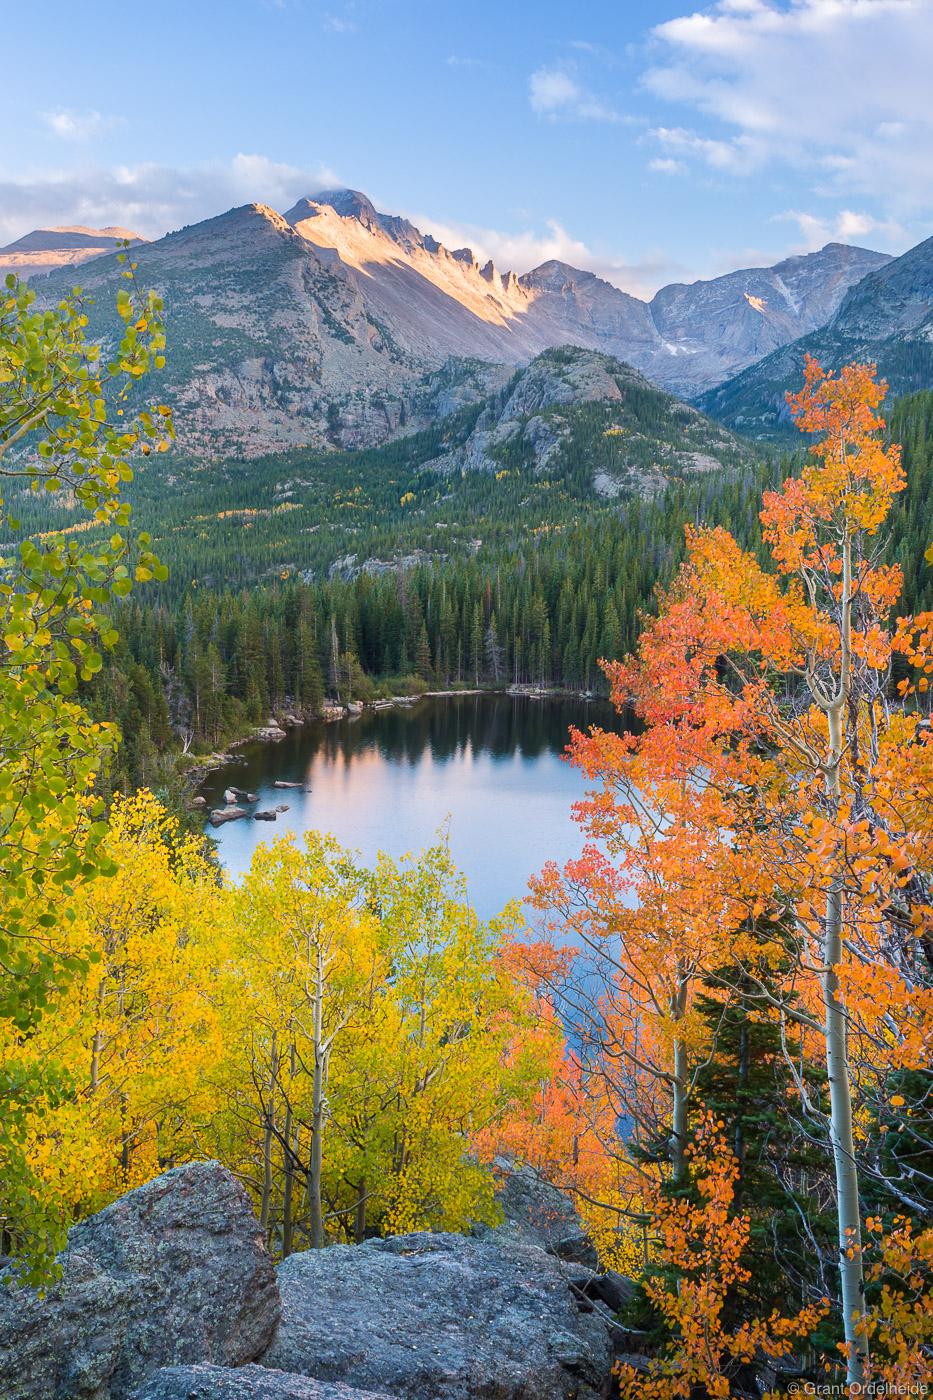 bear, lake, autumn, rocky, mountain, national, park, colorado, colored, aspens, longs, peak, bear, lake, photo